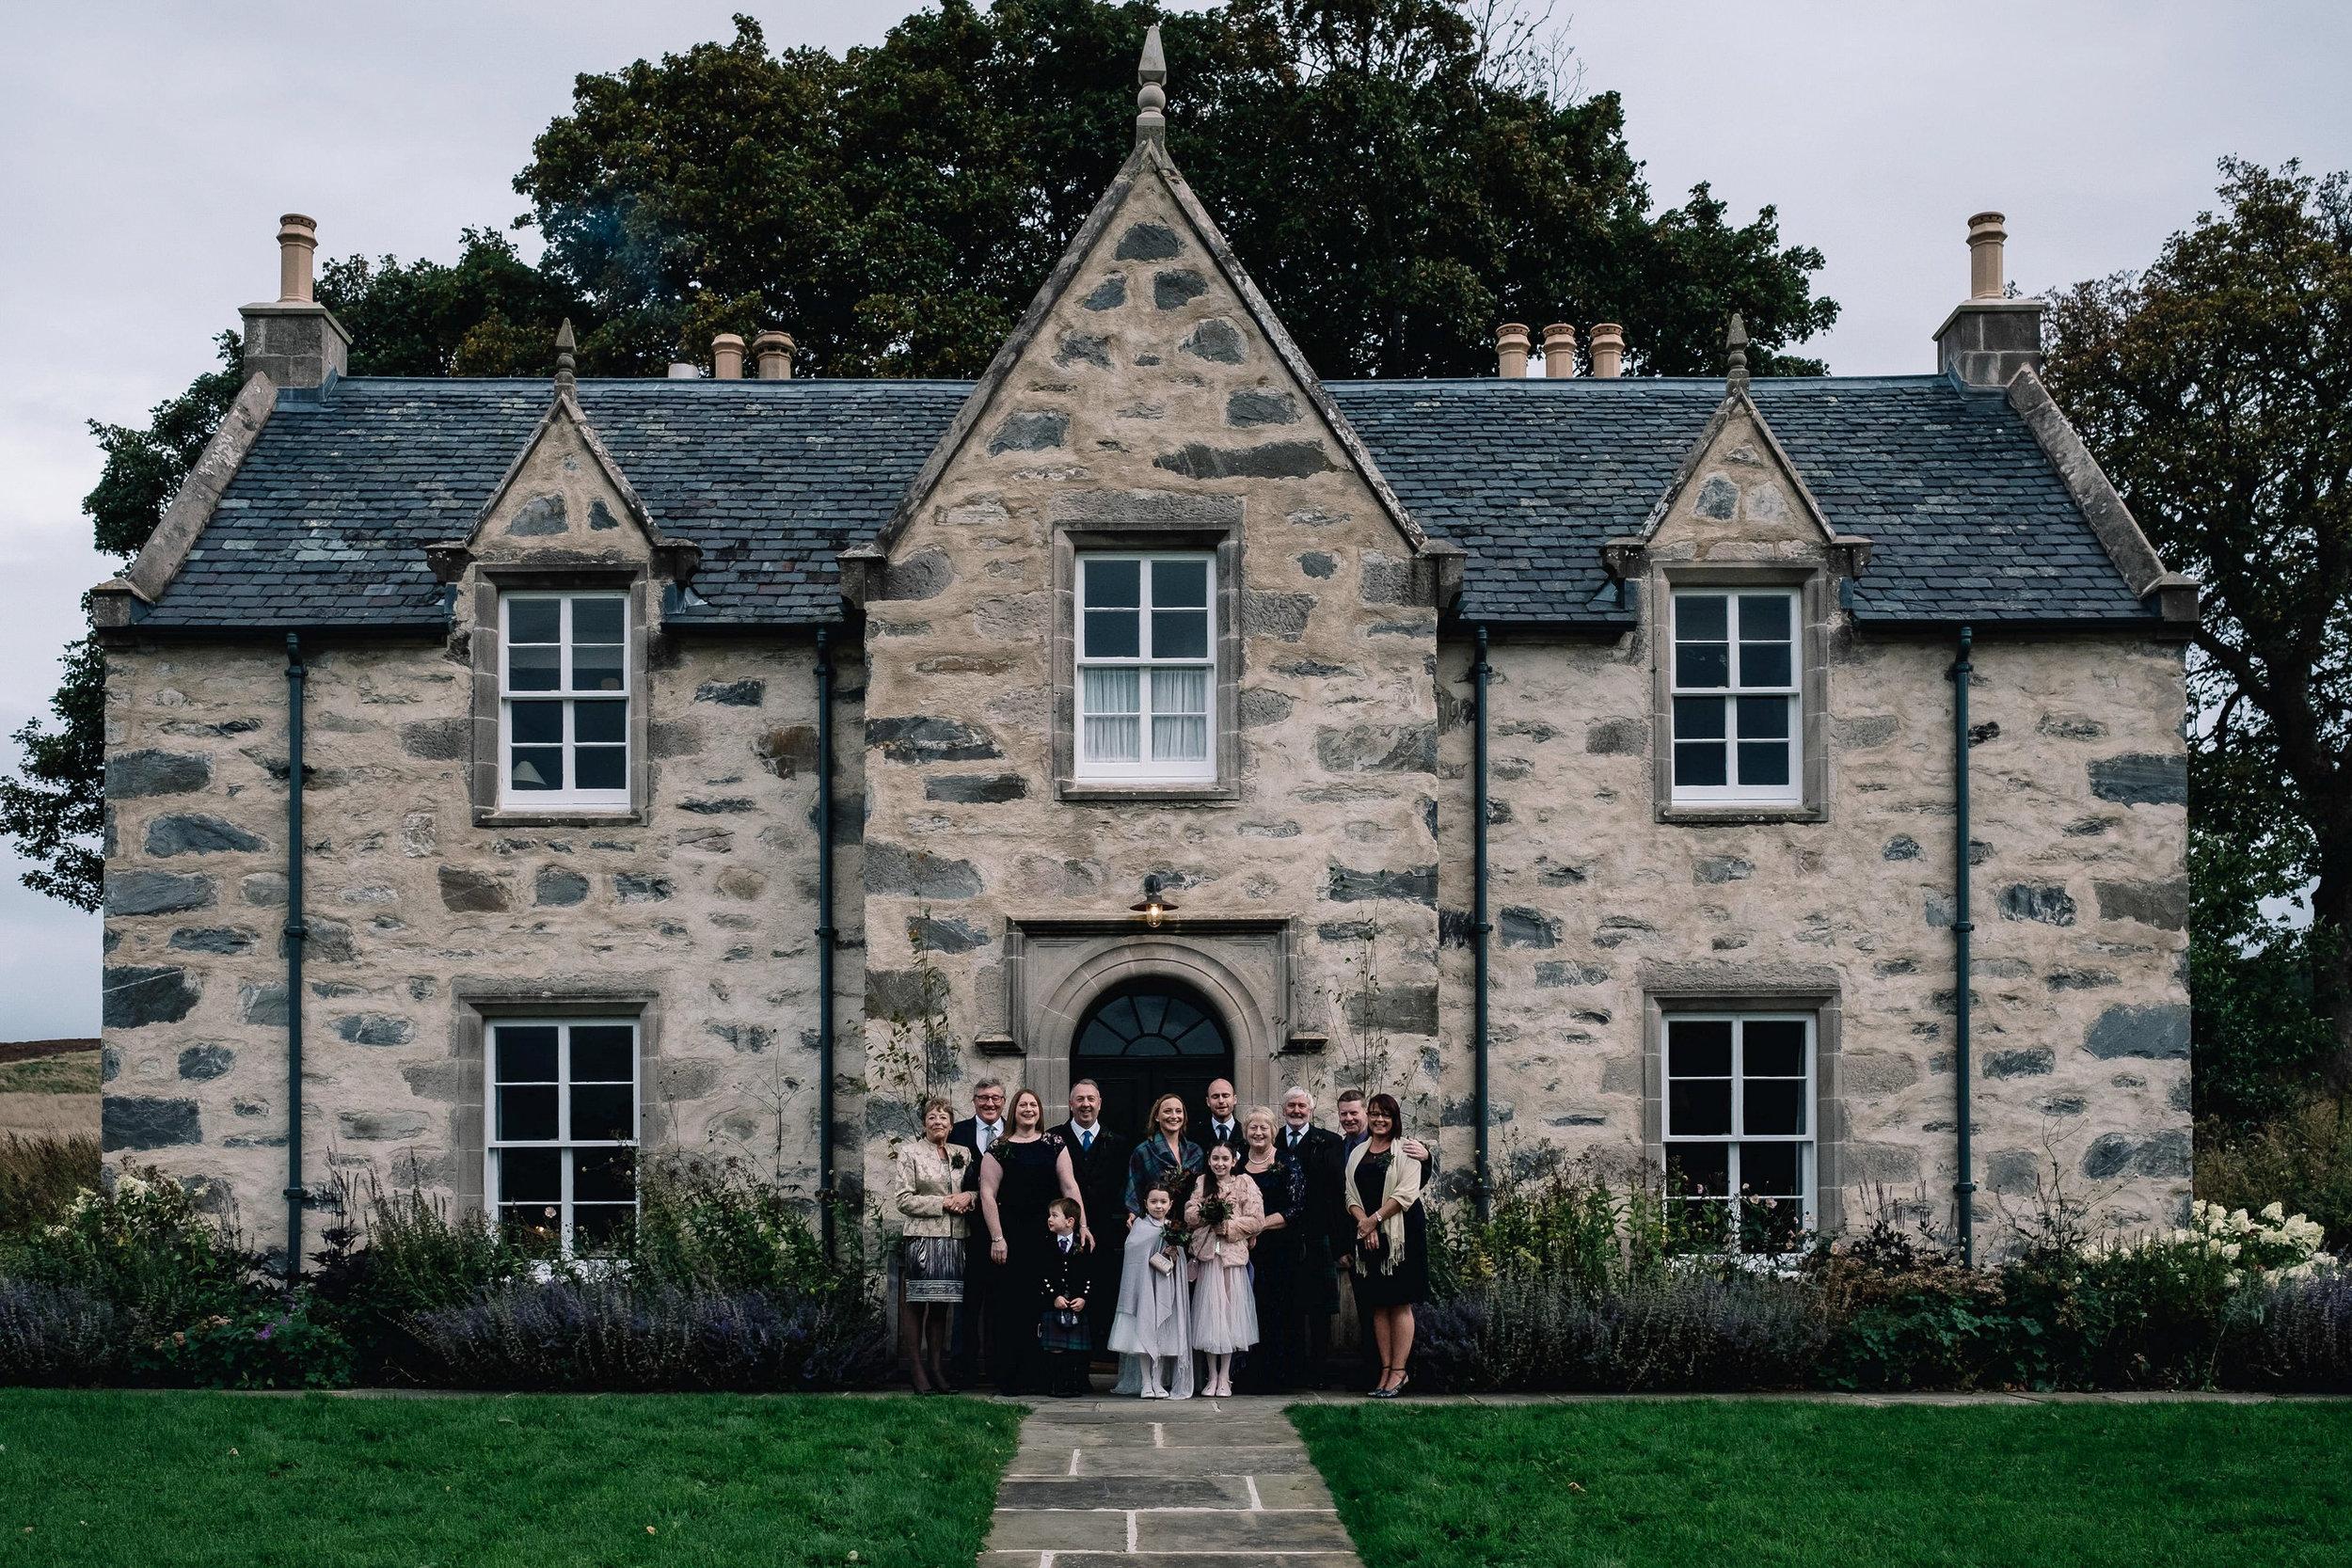 Full wedding party group shot outside of Killiehuntly Farmhouse